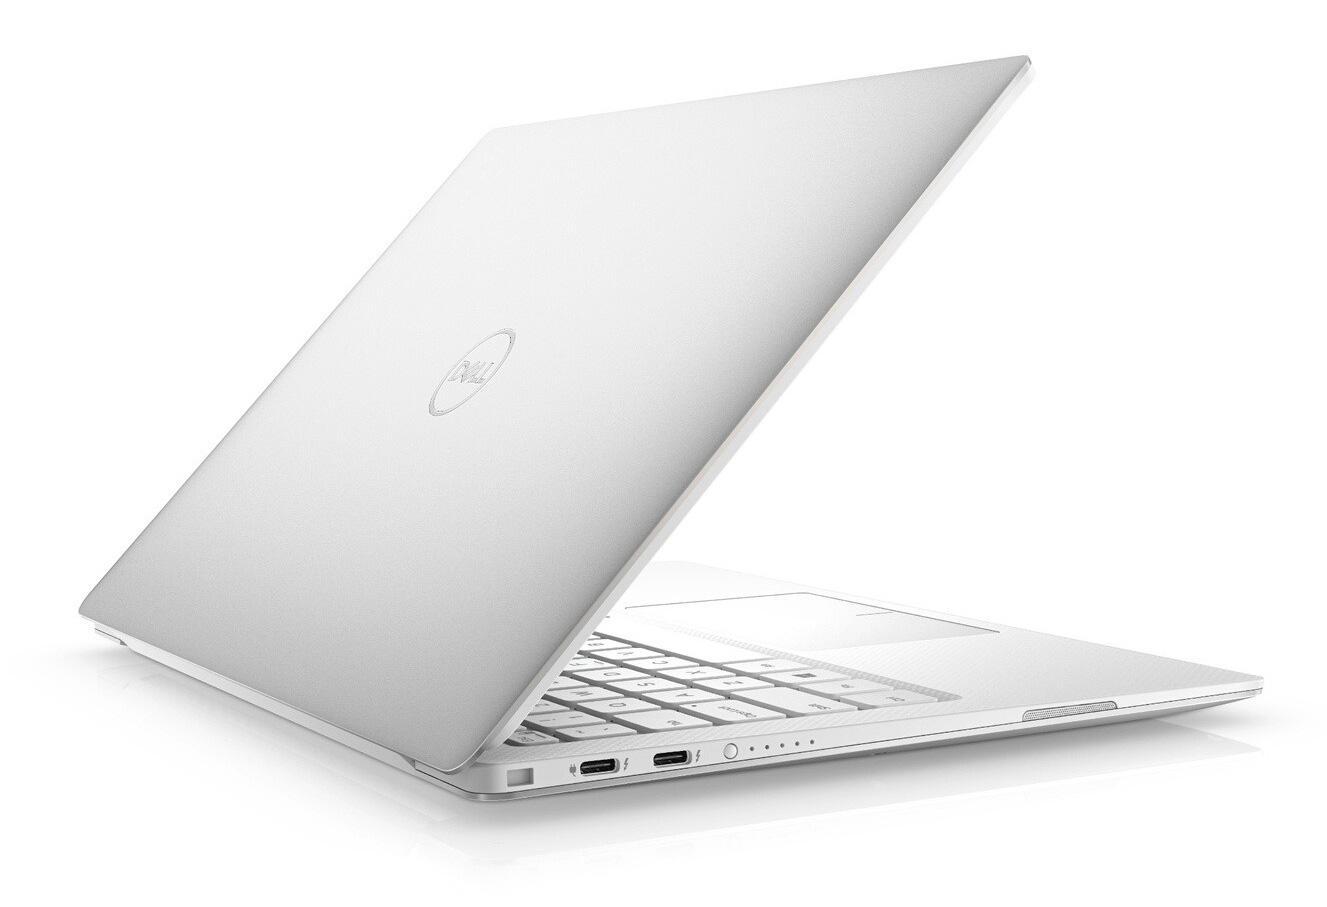 Image du PC portable Dell XPS 13 7390 Blanc - Core i5, 8 Go, 512 Go